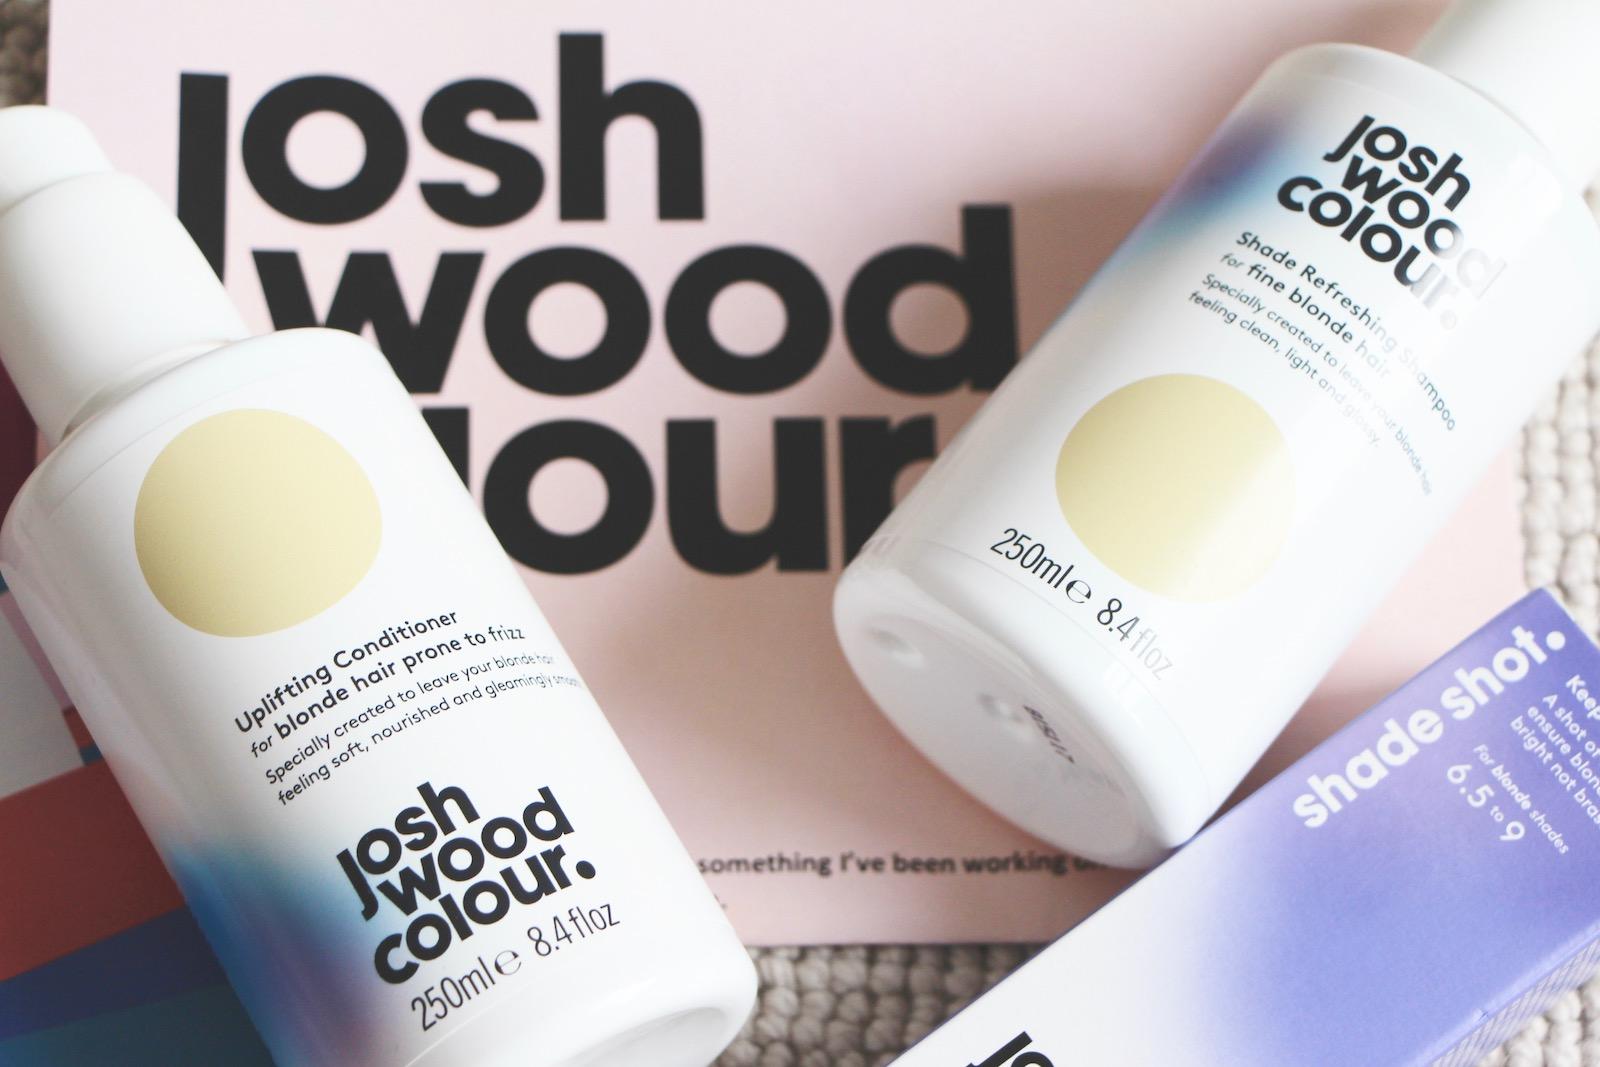 josh wood blonde shampoo and conditioner